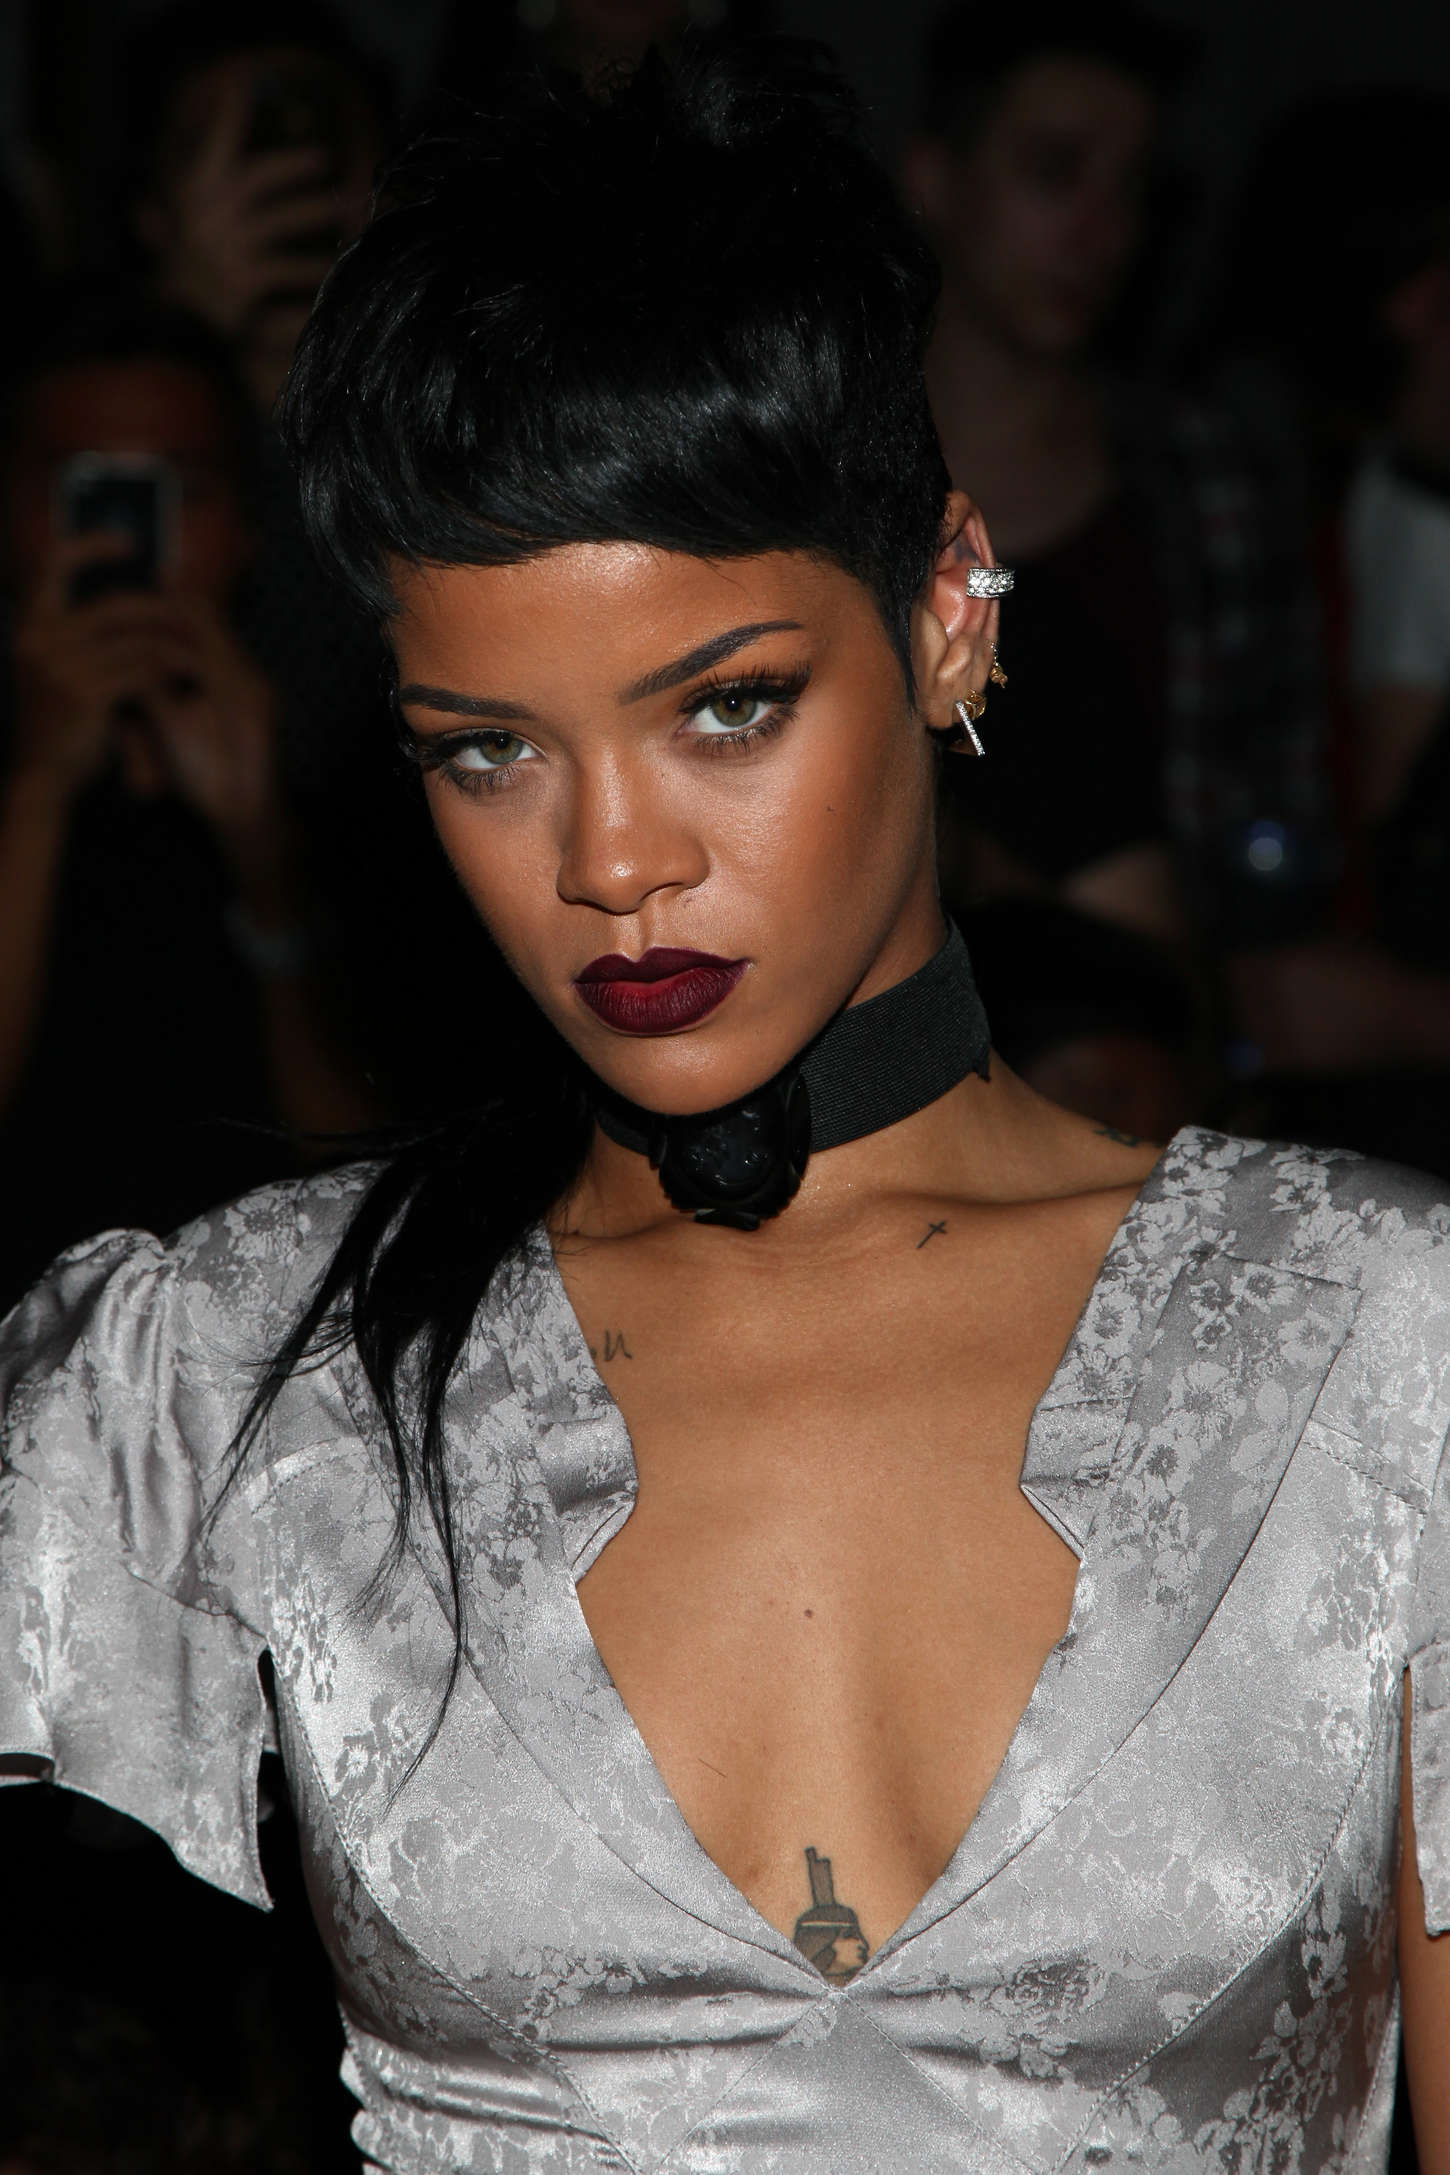 Rihanna Biography And Latest Images 2013 | subtat |Rihanna 2013